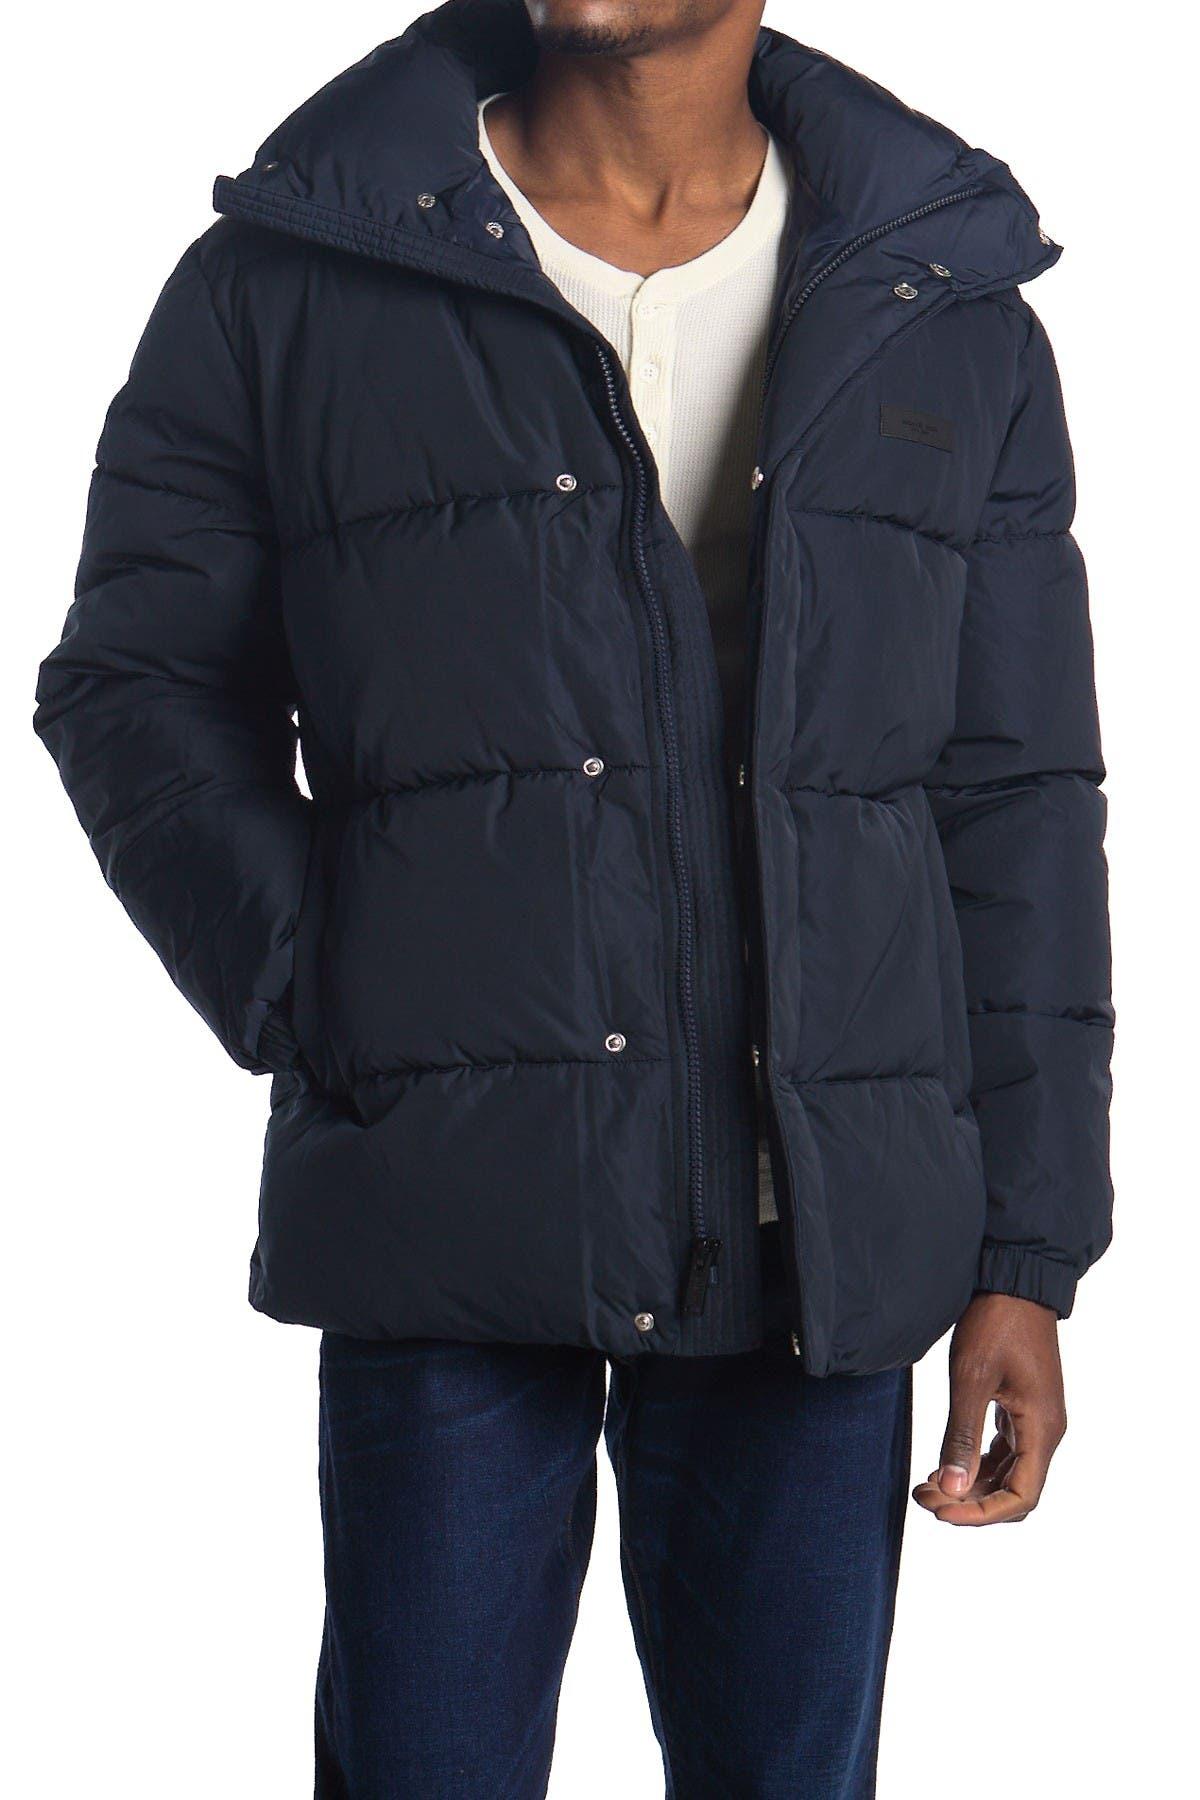 Image of Michael Kors High Denier Wide Quilt Jacket